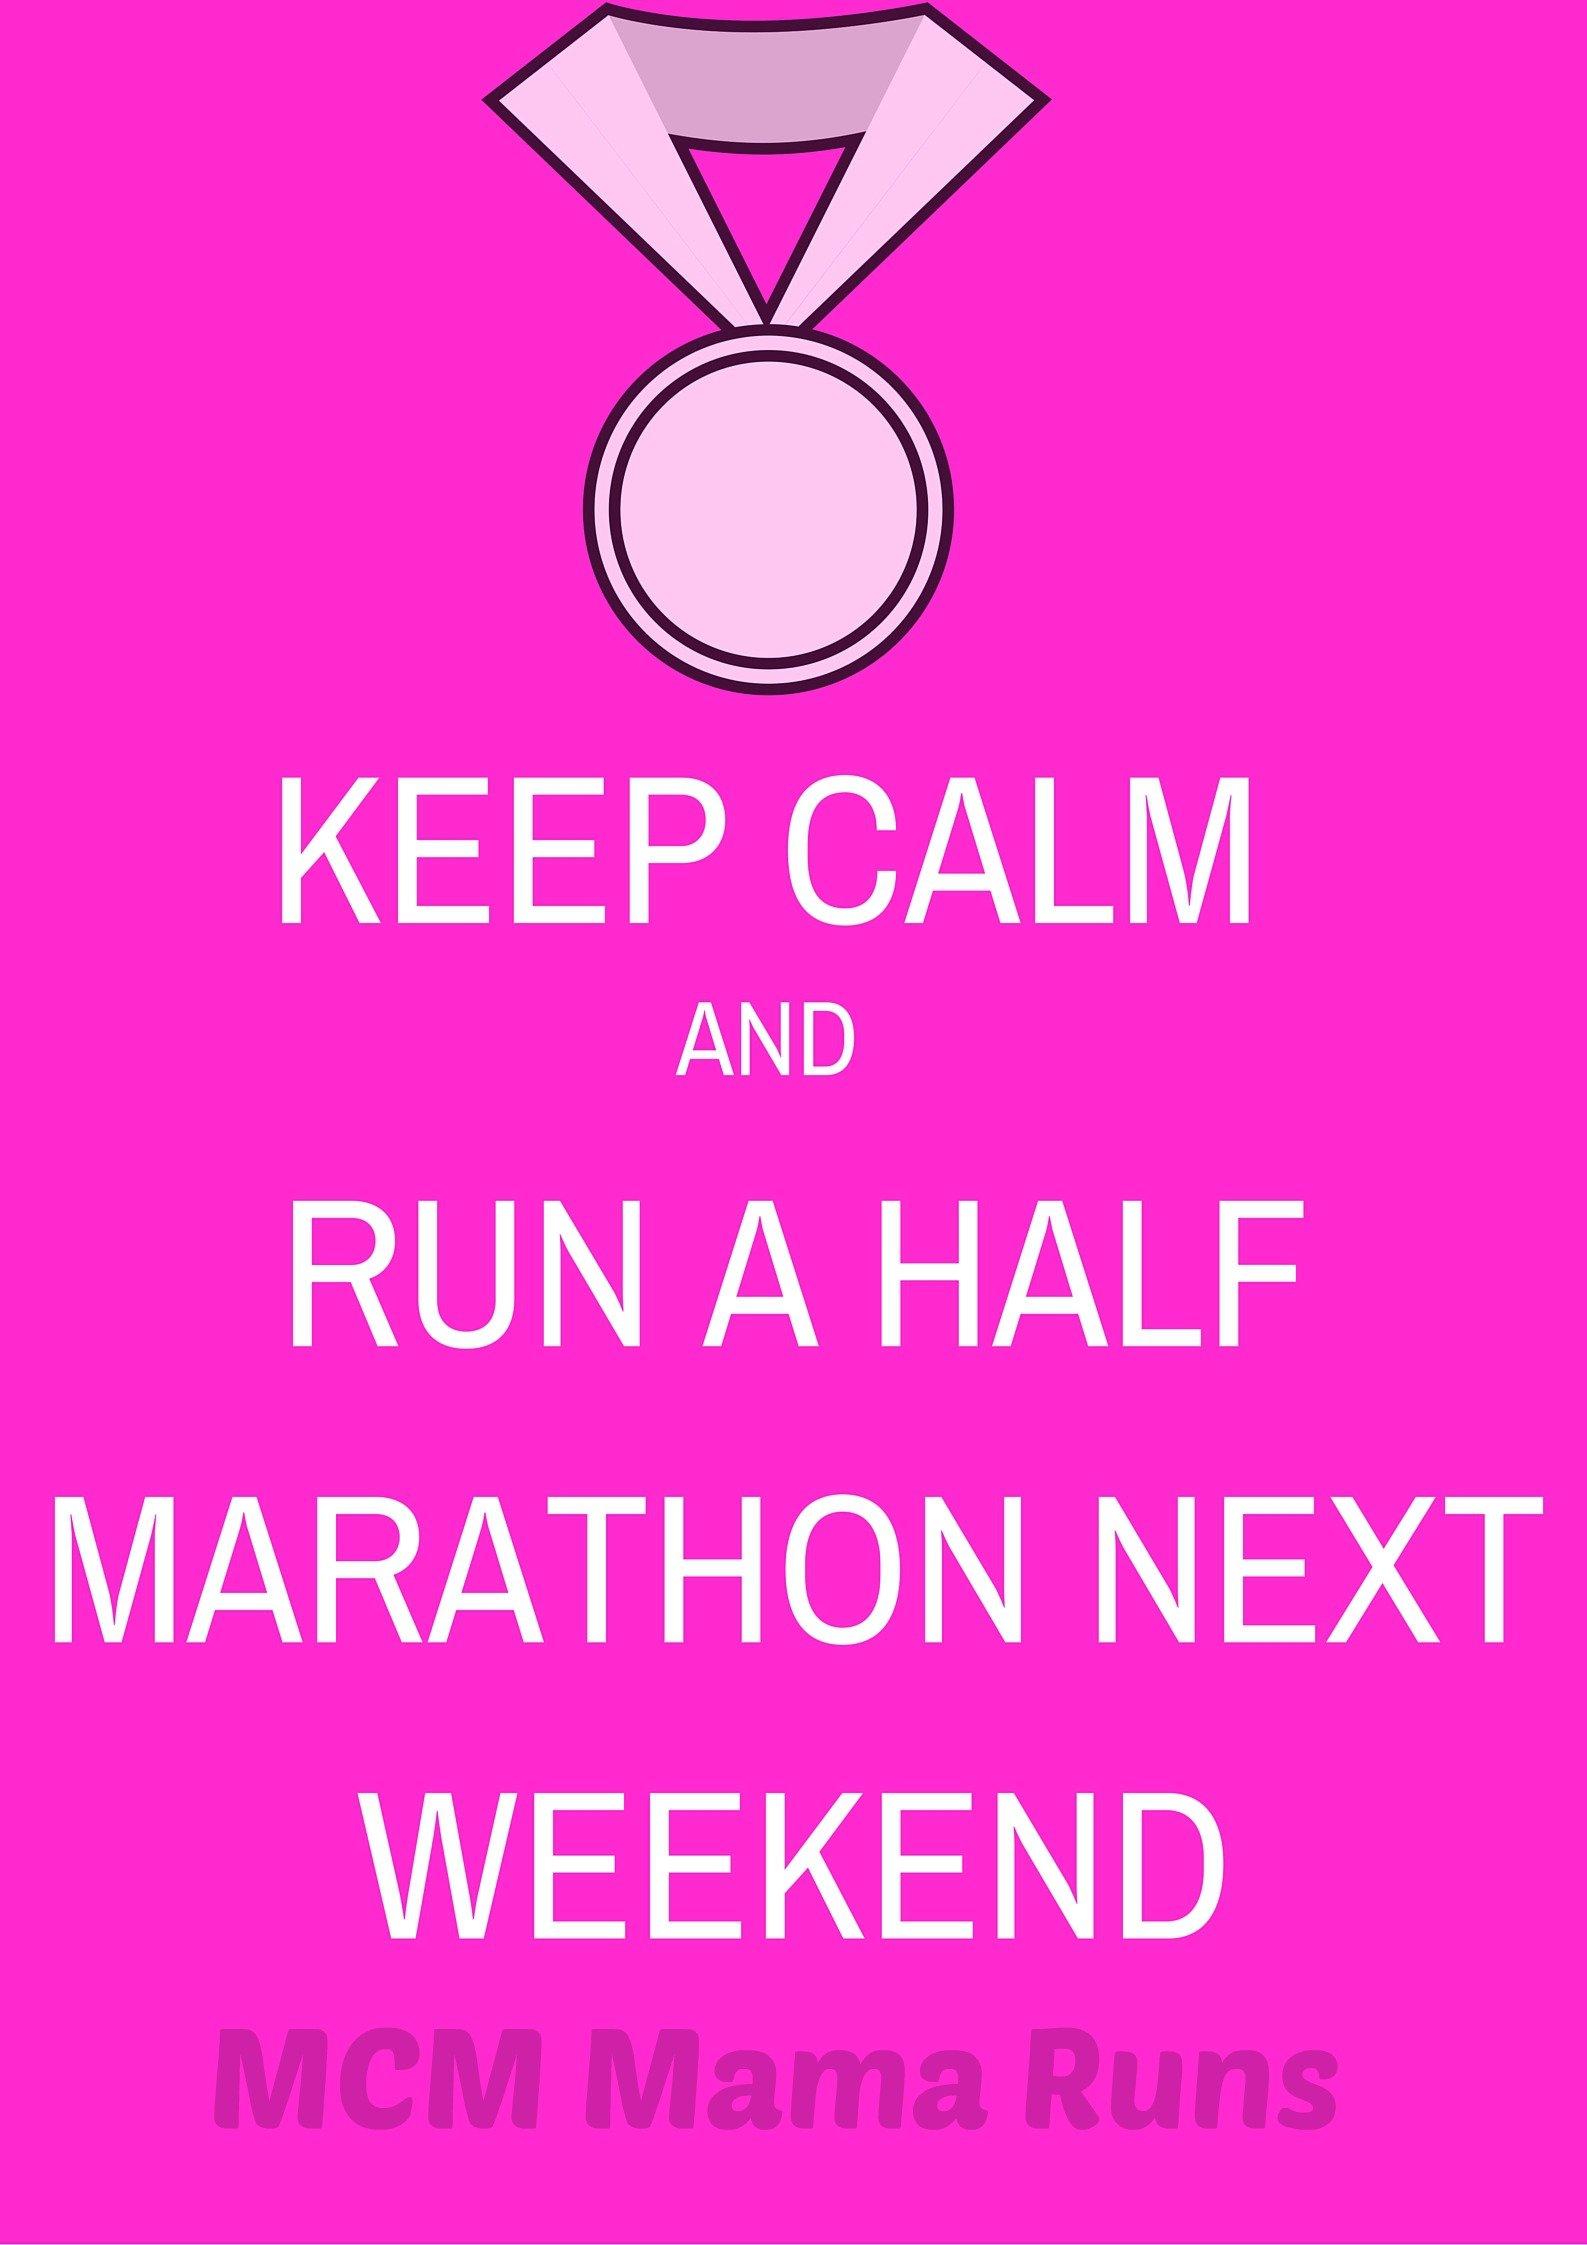 Keep Calm half marathon